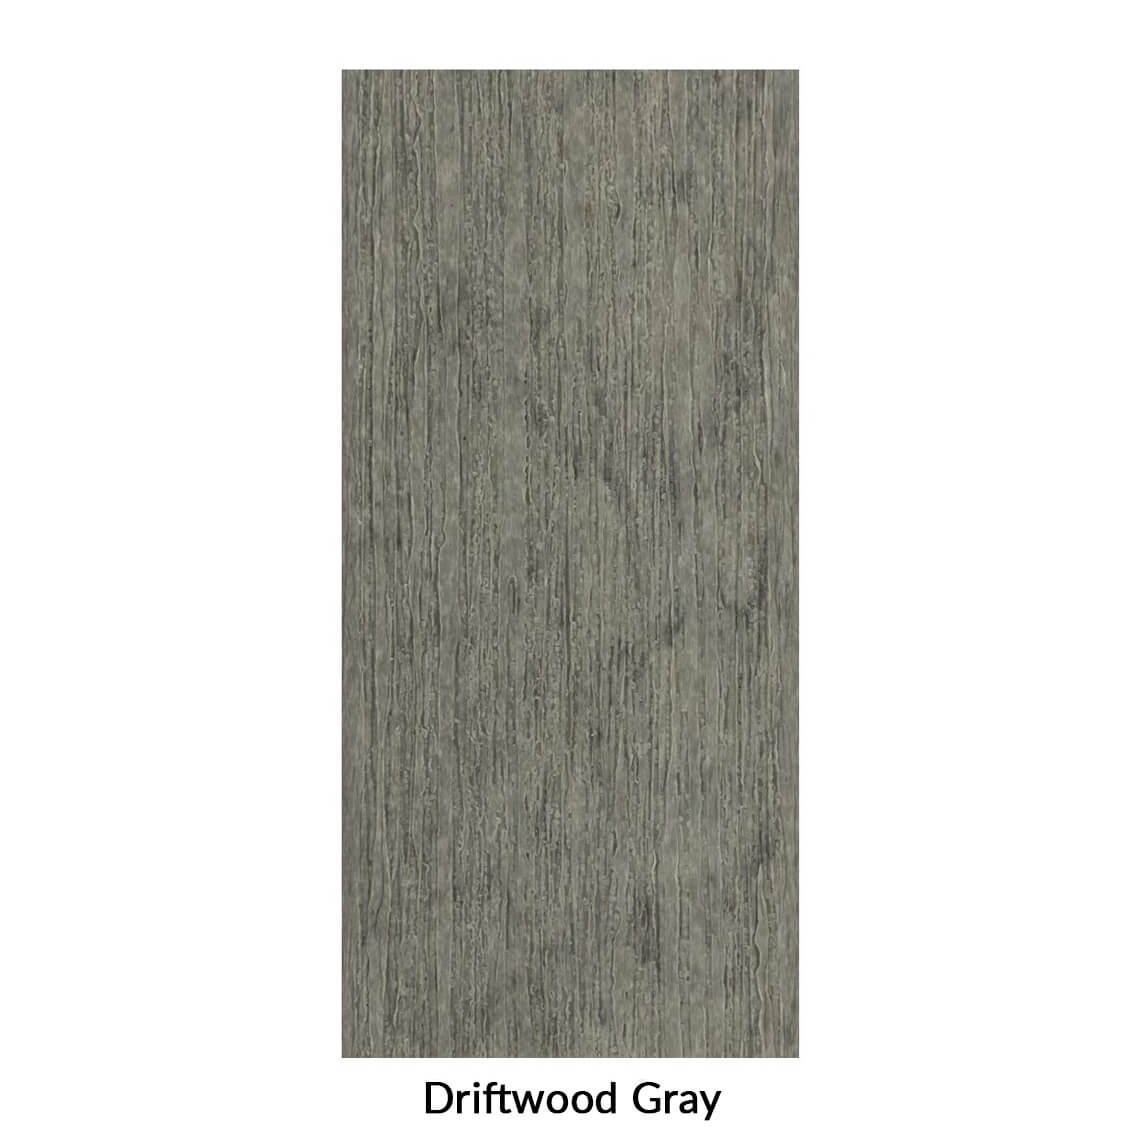 0.3-driftwood-gray.jpg